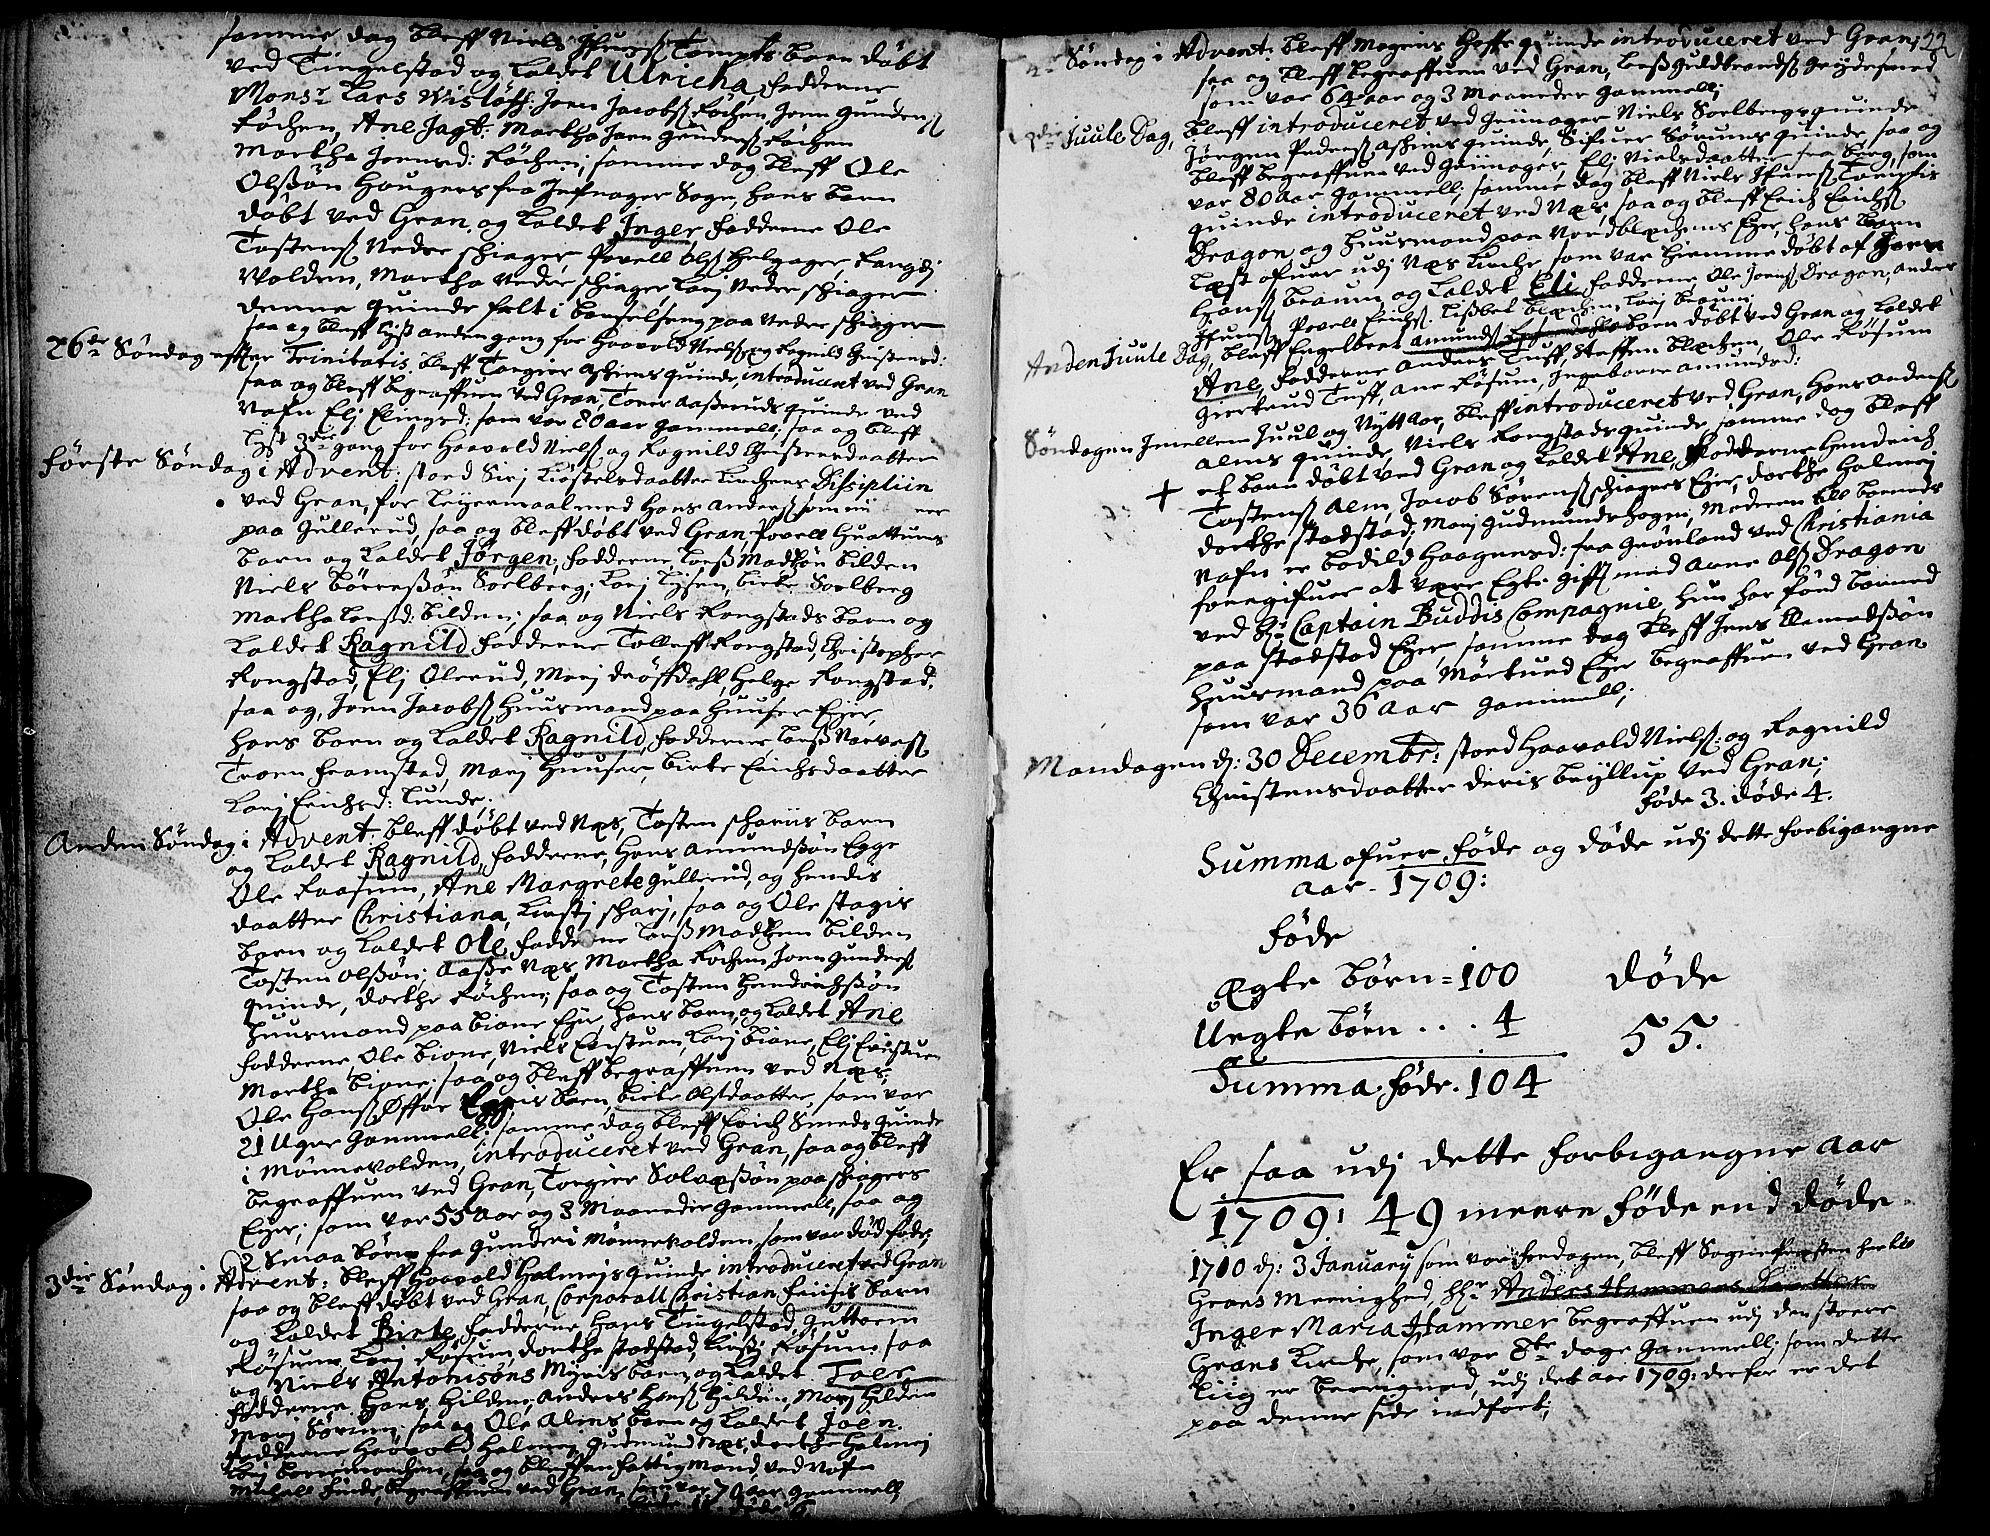 SAH, Gran prestekontor, Ministerialbok nr. 1, 1707-1731, s. 22